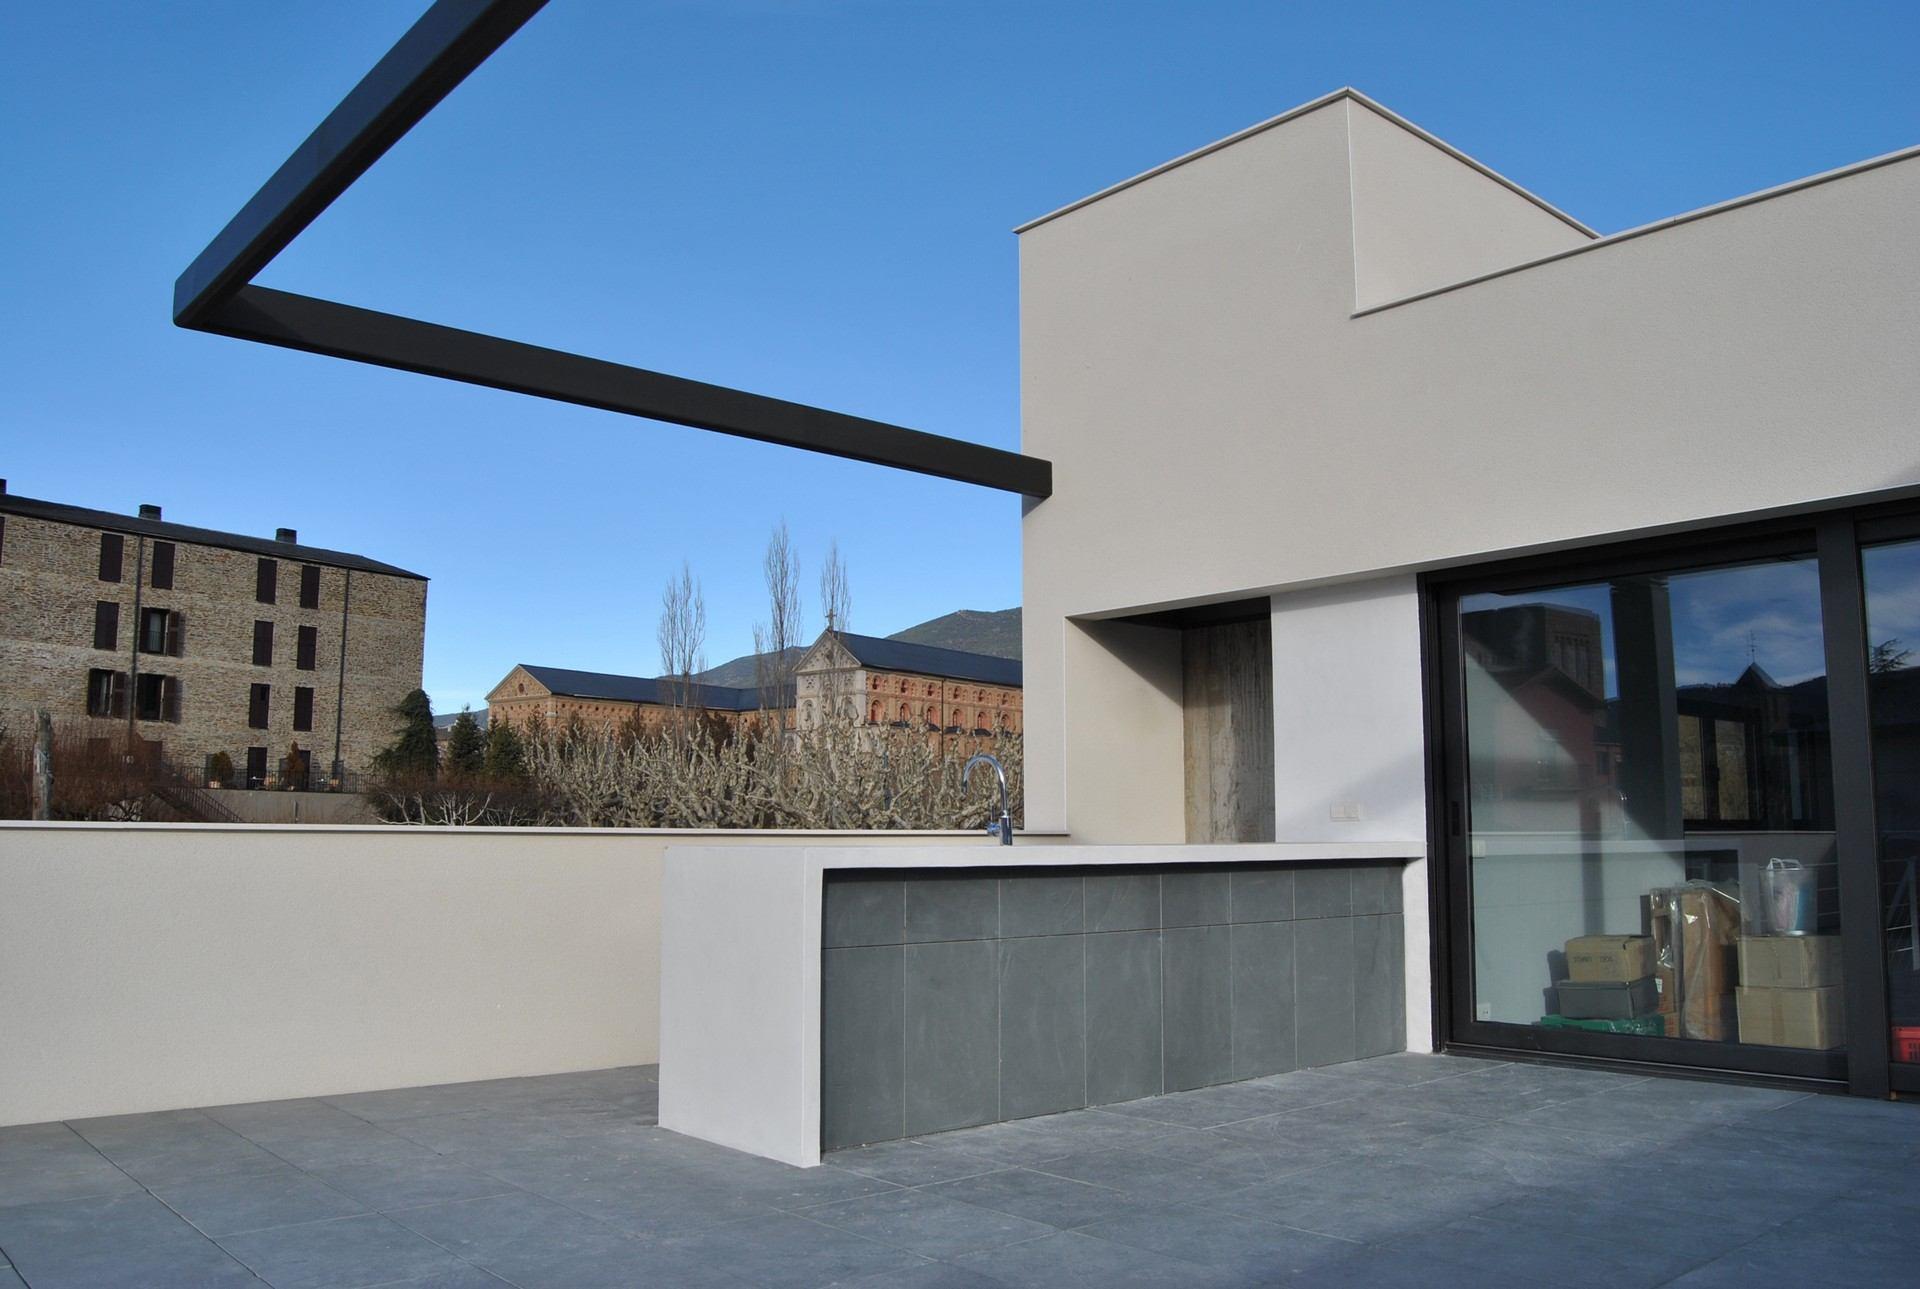 Microcemento para exteriores, revestimientos de exterior